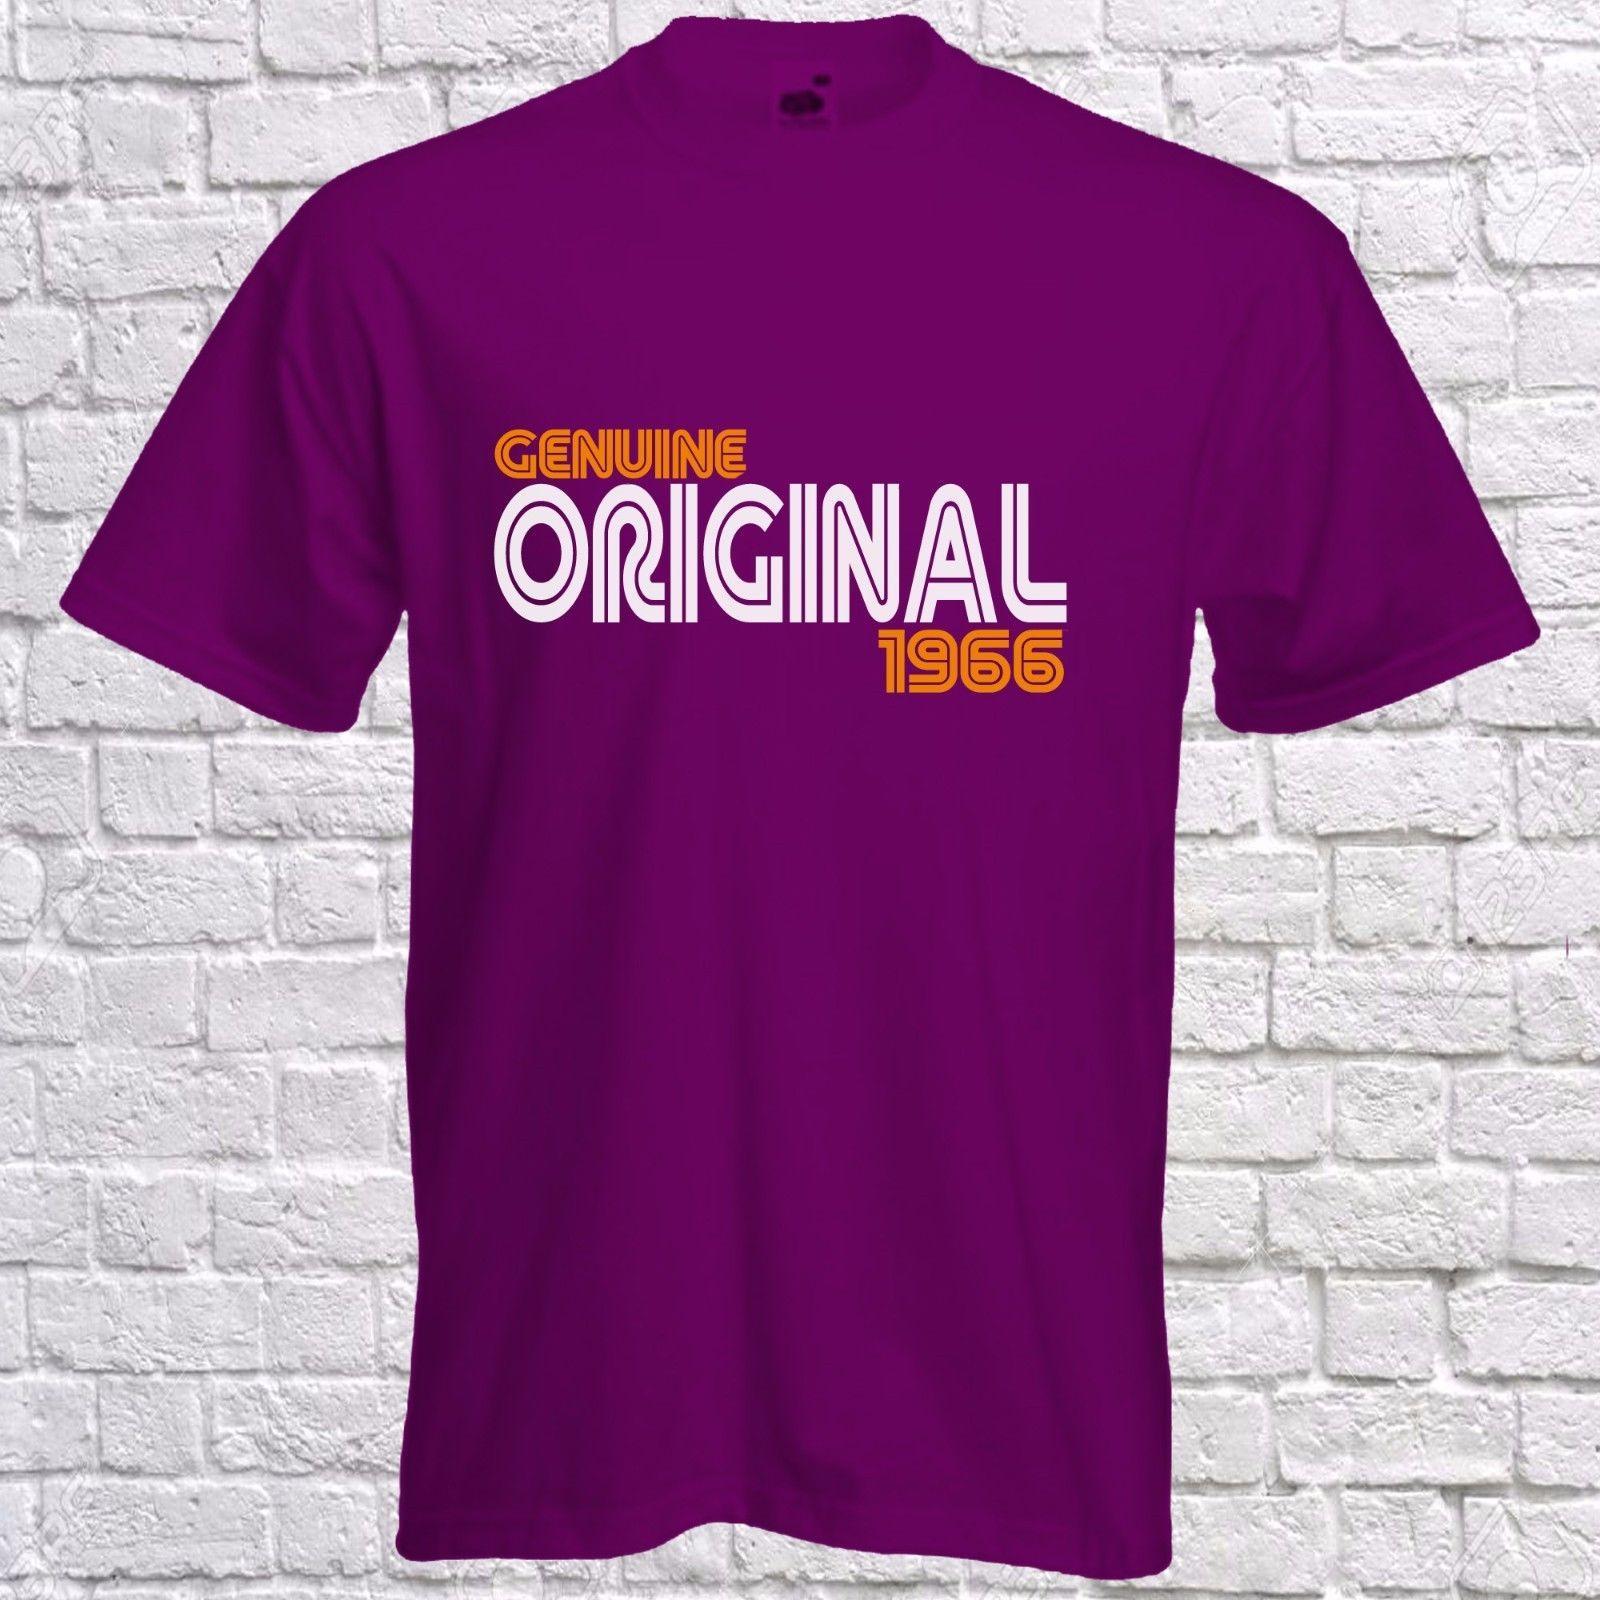 50th Birthday Tshirt Genuine Original Since 1966 T Mens Short Sleeved Tee Funny Unisex Top Shirt Cool Designs From Handdrawntees